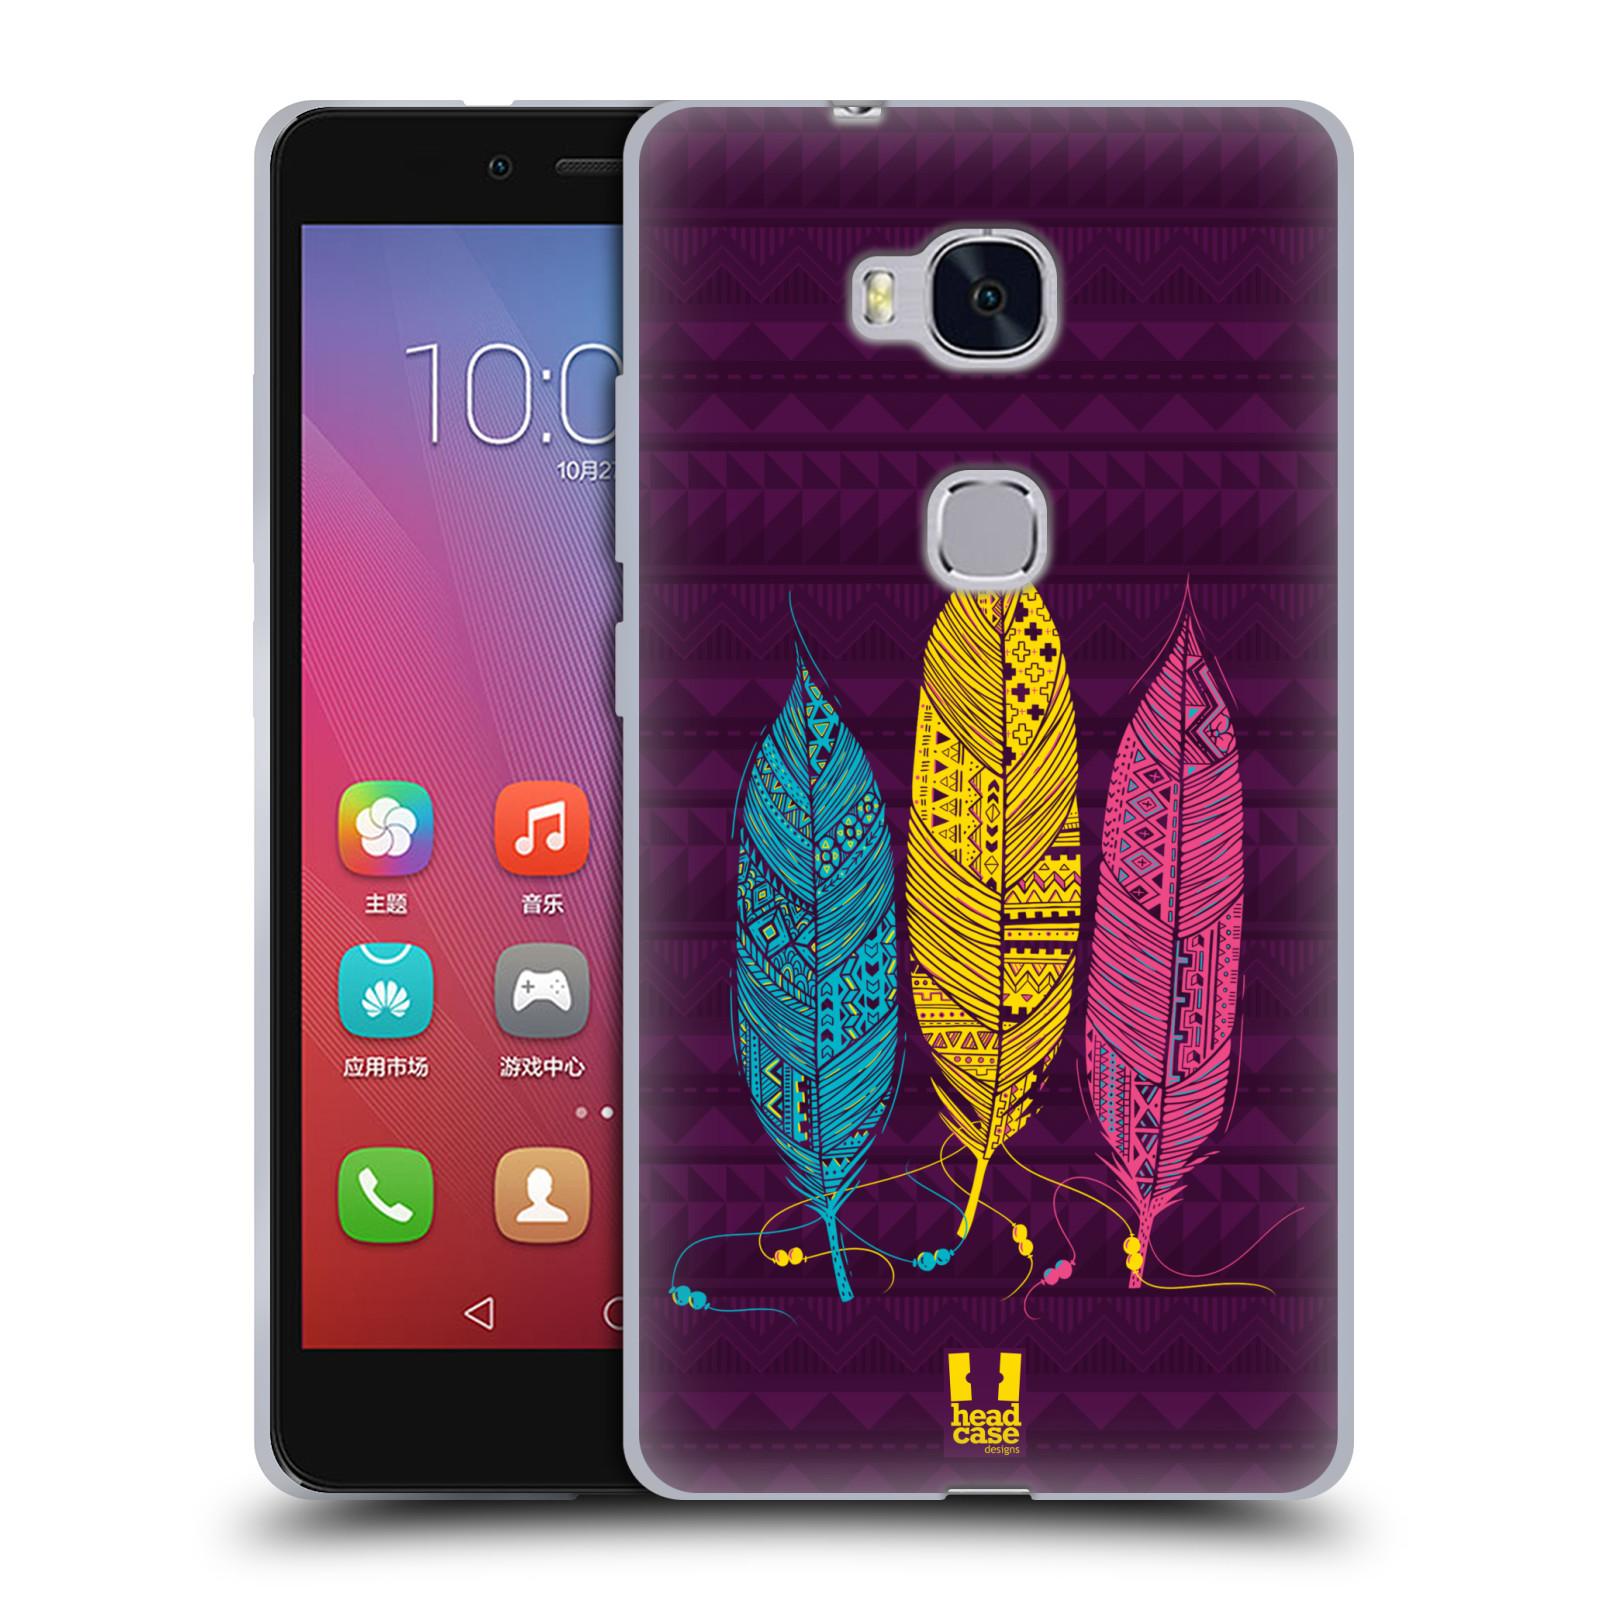 Silikonové pouzdro na mobil Honor 5X HEAD CASE AZTEC PÍRKA 3 BAREV (Silikonový kryt či obal na mobilní telefon Huawei Honor 5X)